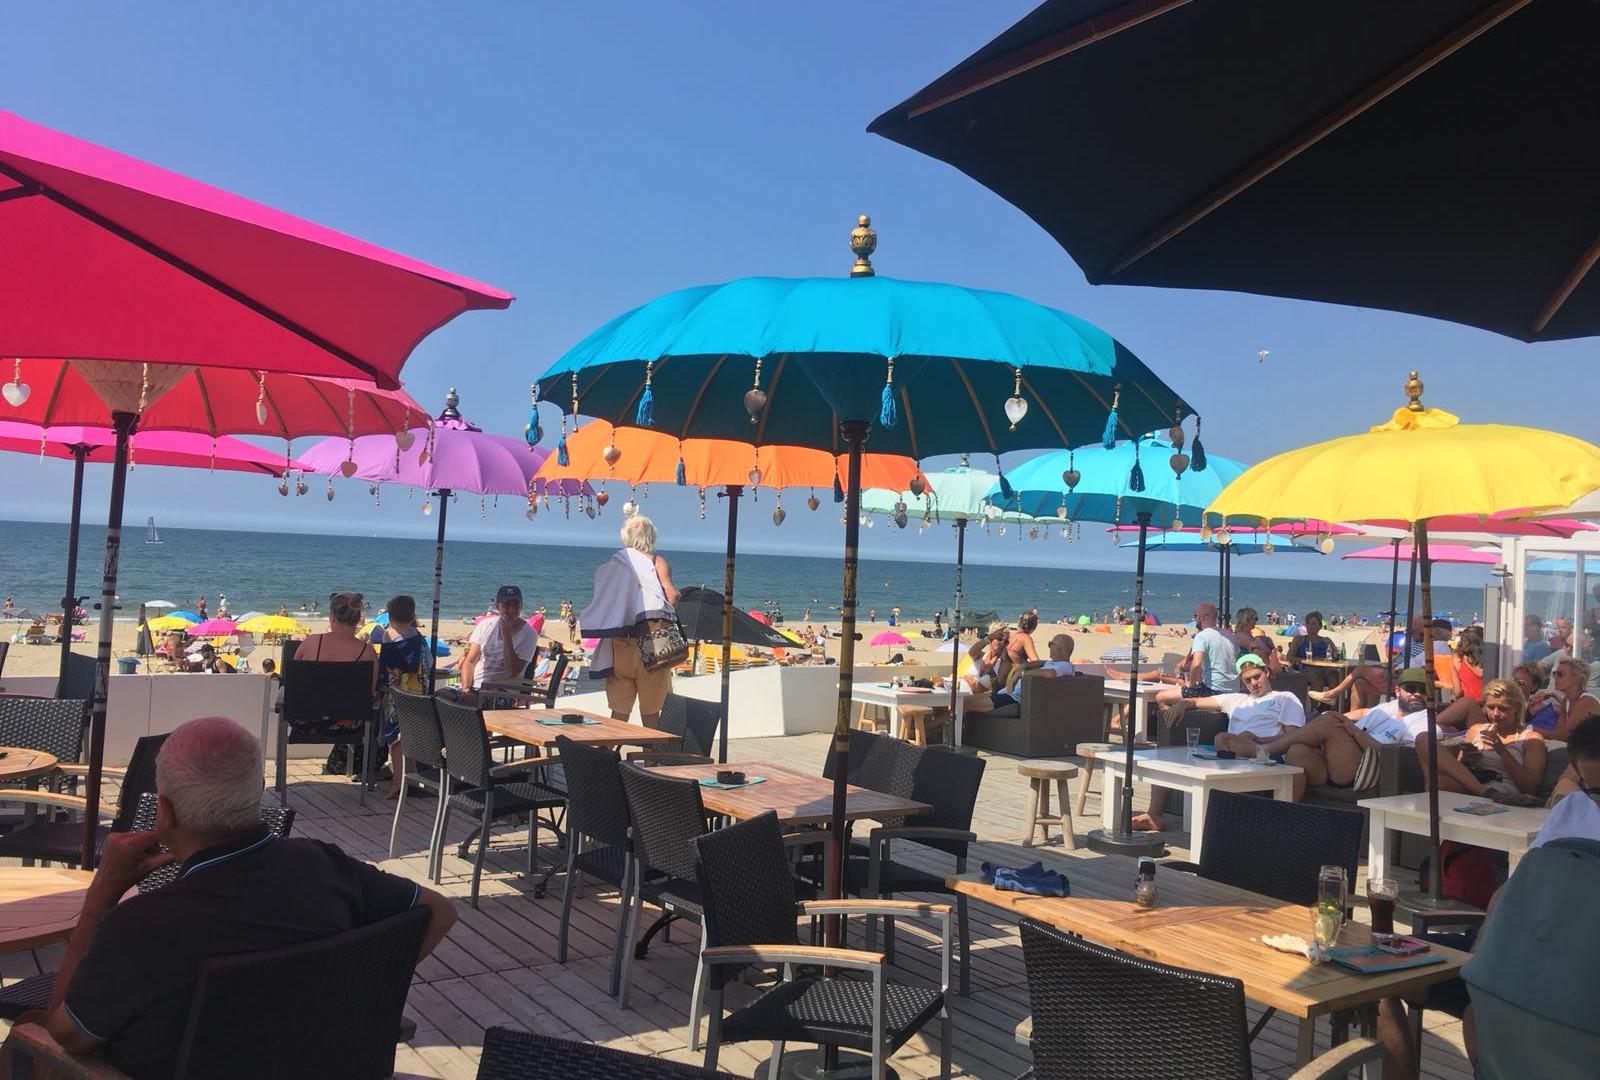 Top quality balinese umbrellas